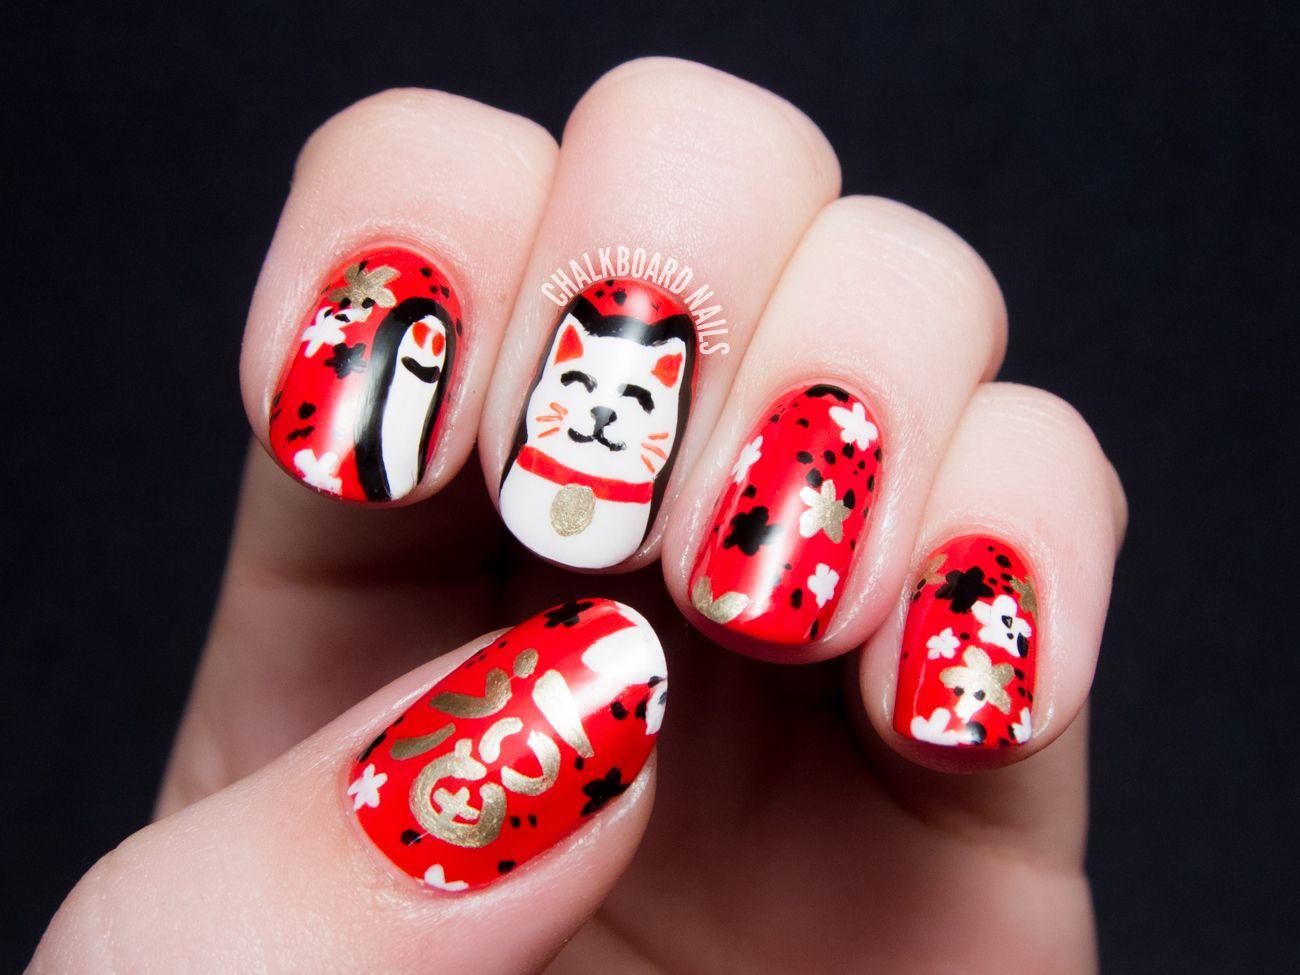 The lacquer legion lucky maneki neko lucky cat nail art summer nail art prinsesfo Images